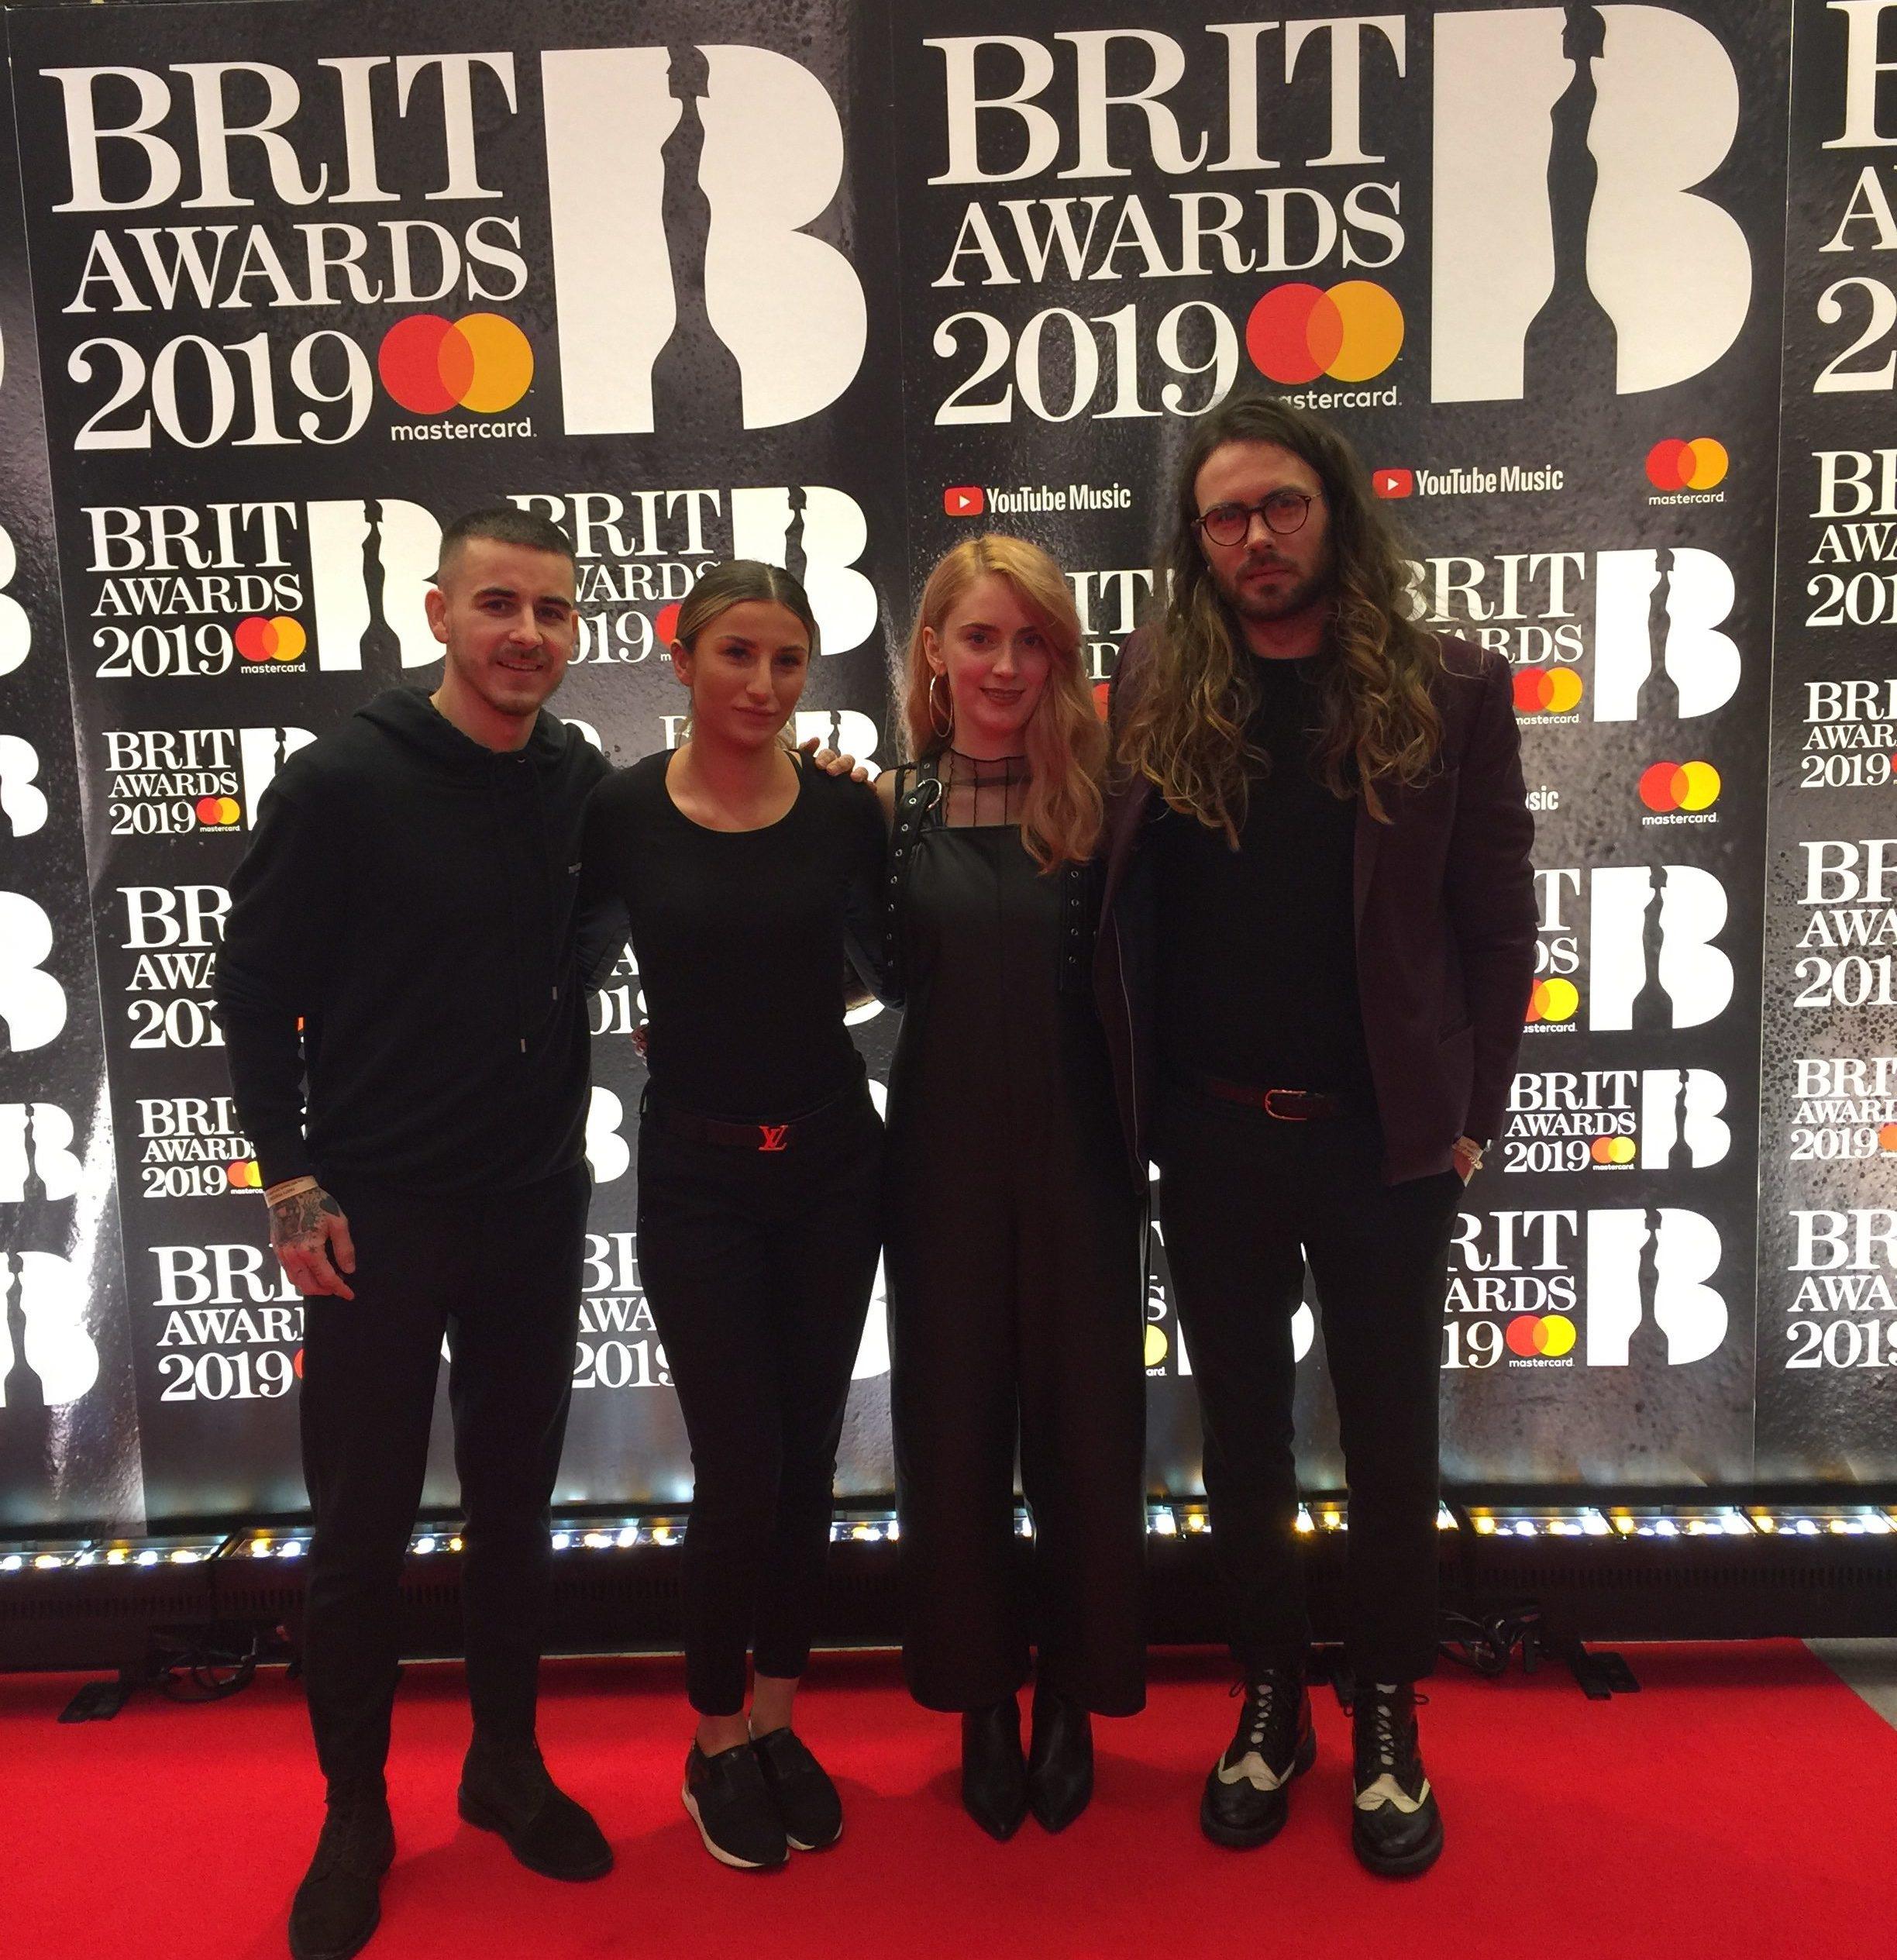 Wella Professionals makes waves at the BRIT Awards